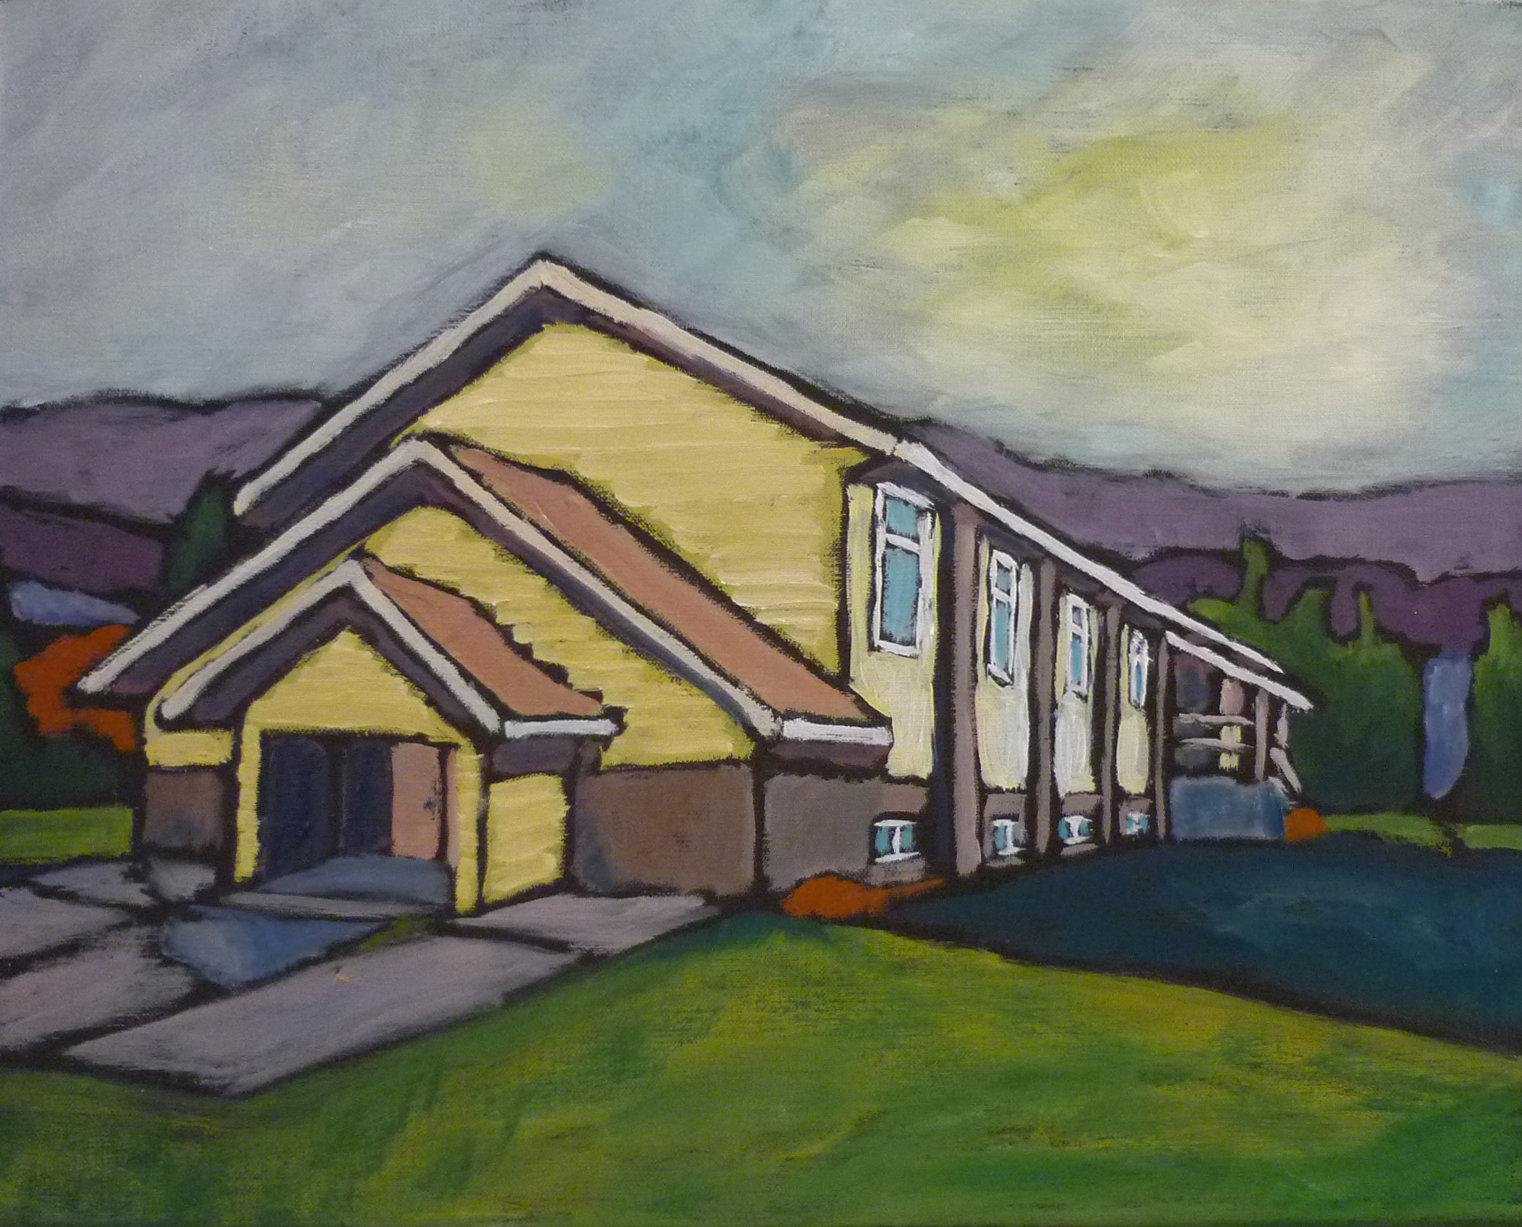 Union of Christian Doukhobors, Krestova, BC by Tea Preville